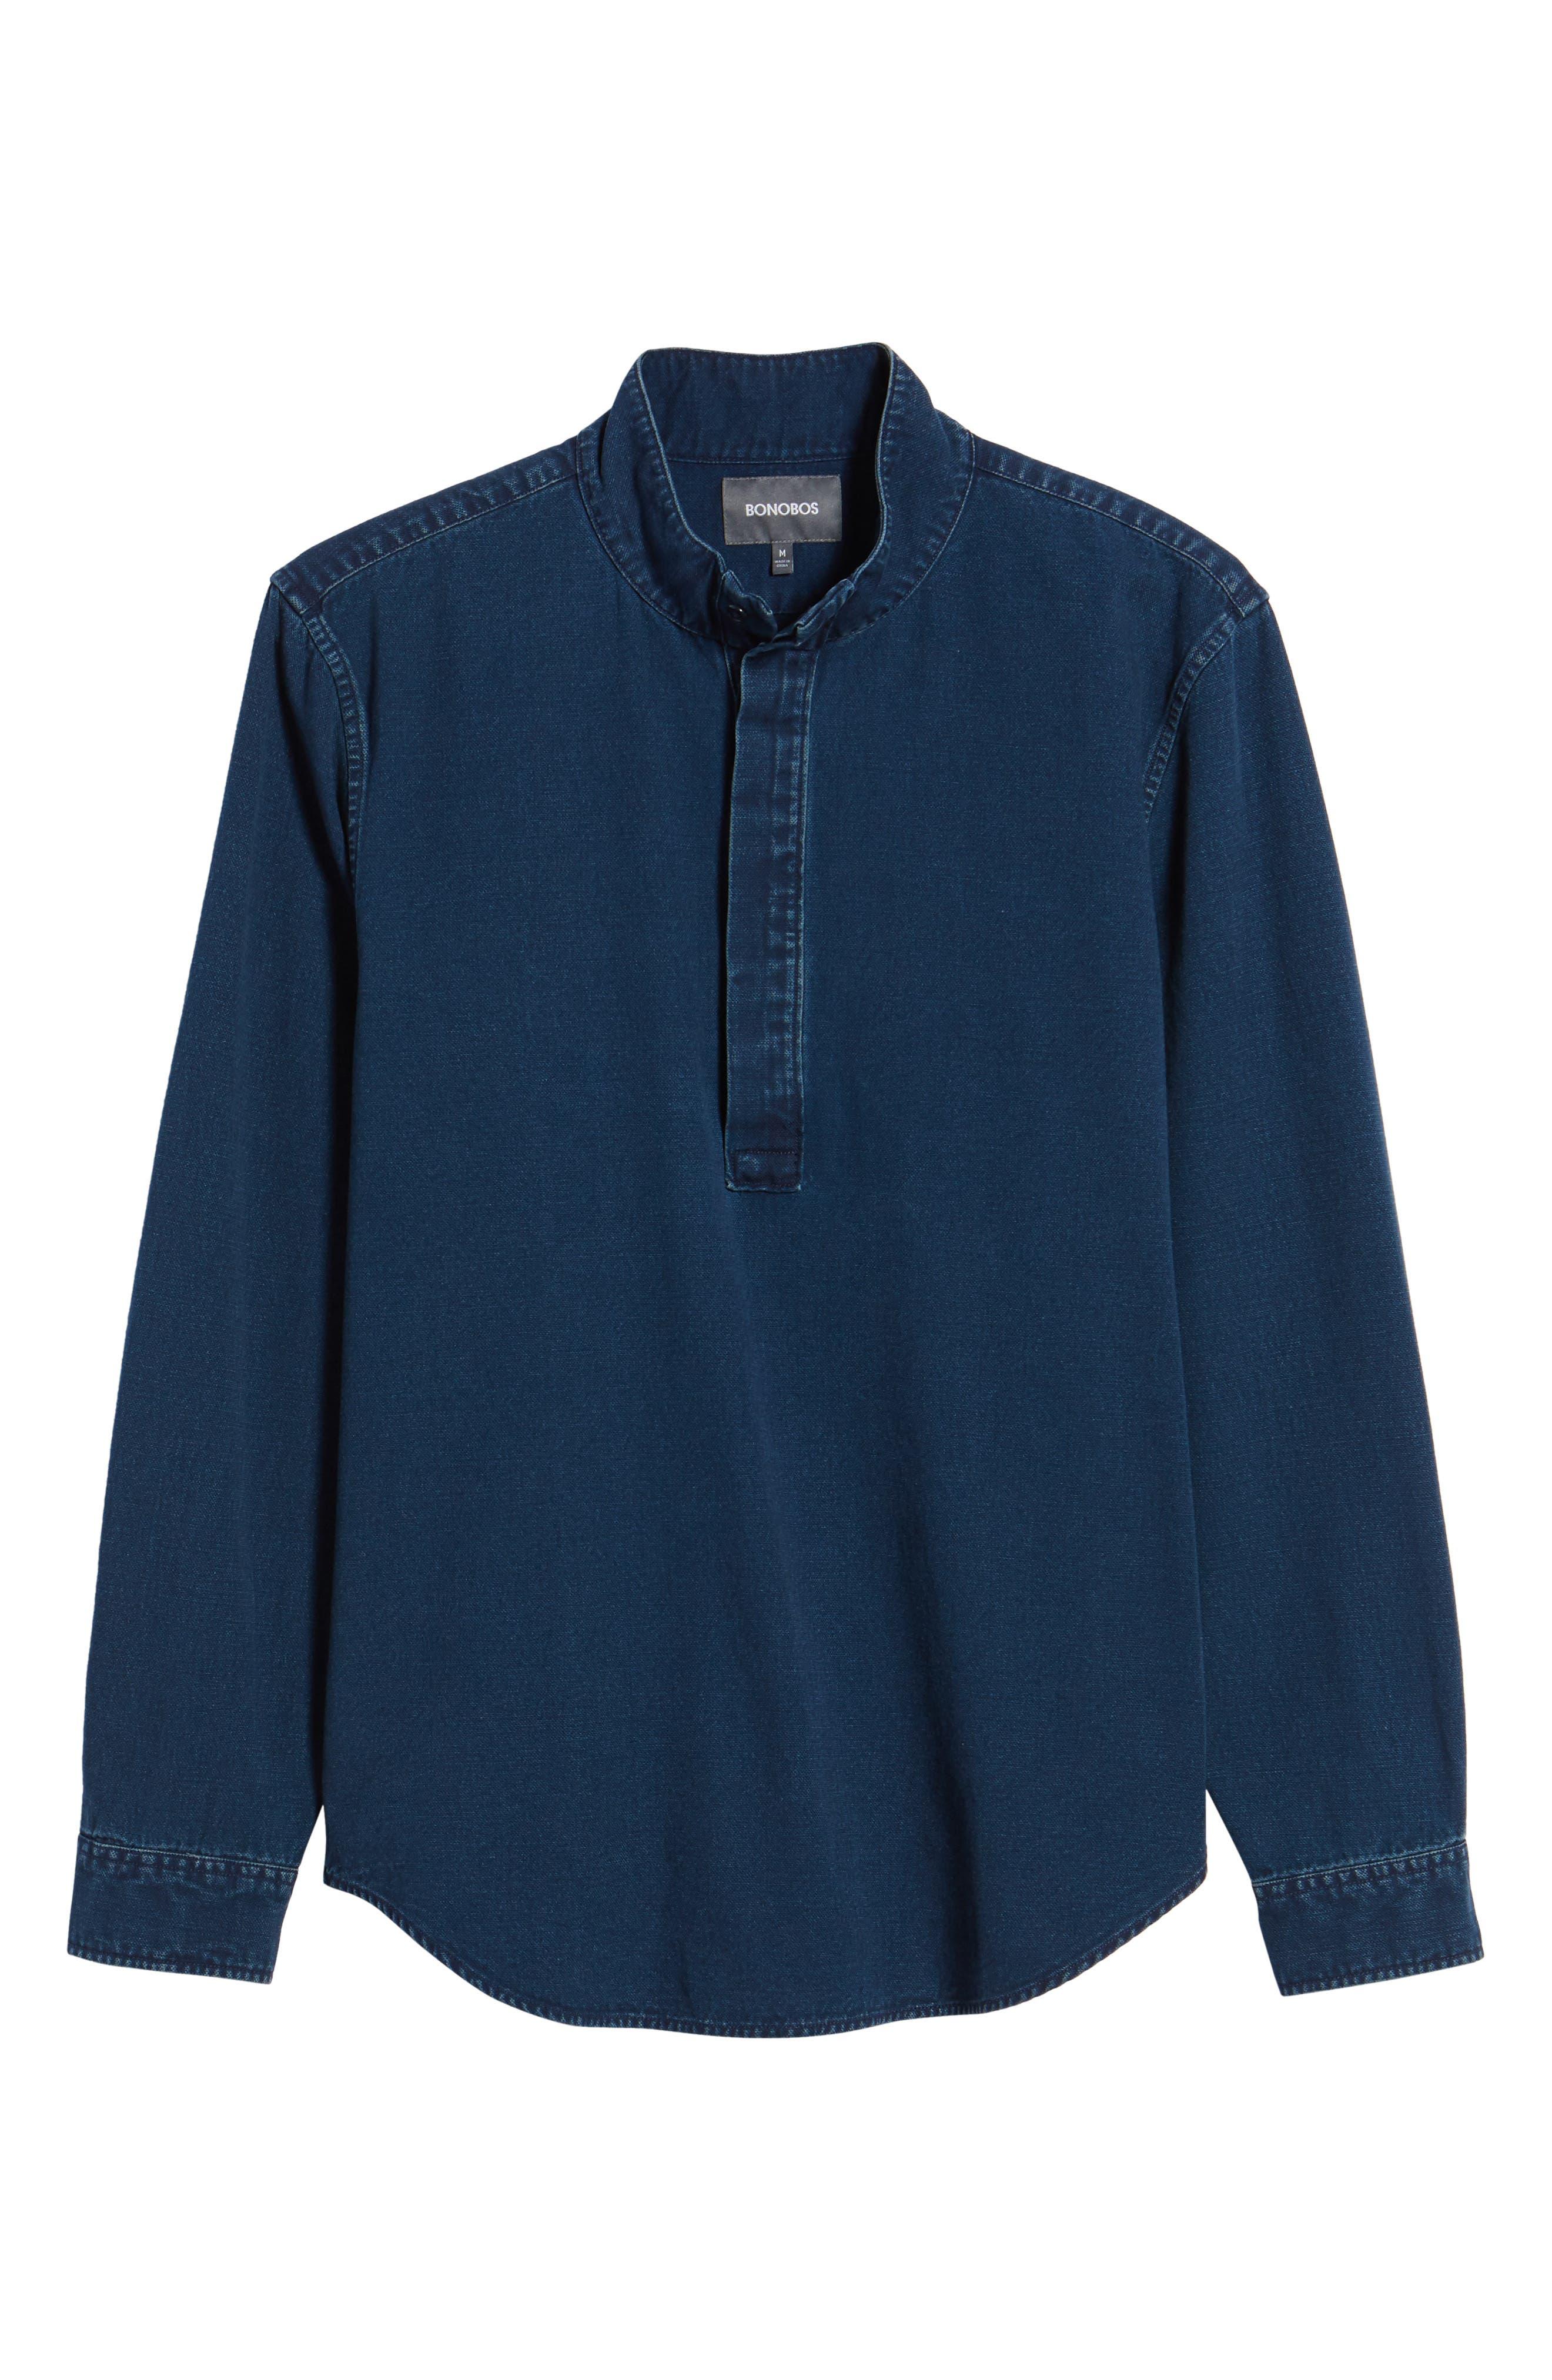 Band Collar Piqué Shirt,                             Alternate thumbnail 6, color,                             400